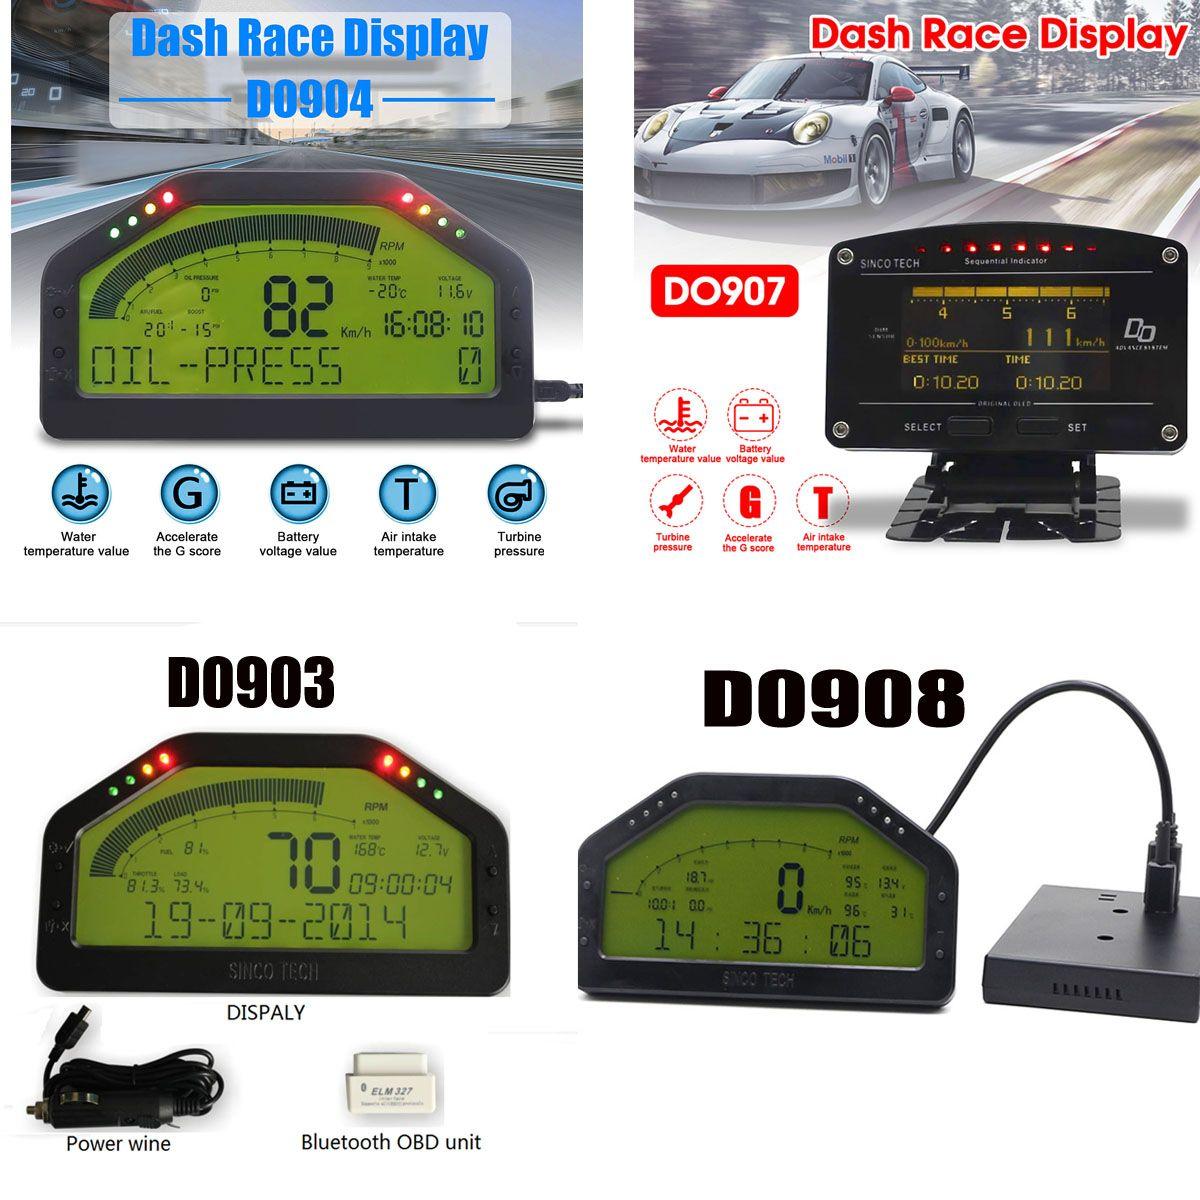 Waterproof Dash Race Display Full Sensor Kit LCD Screen OBD Bluetooh Connection Universal Dash Board DO903 DO904 DO907 DO908